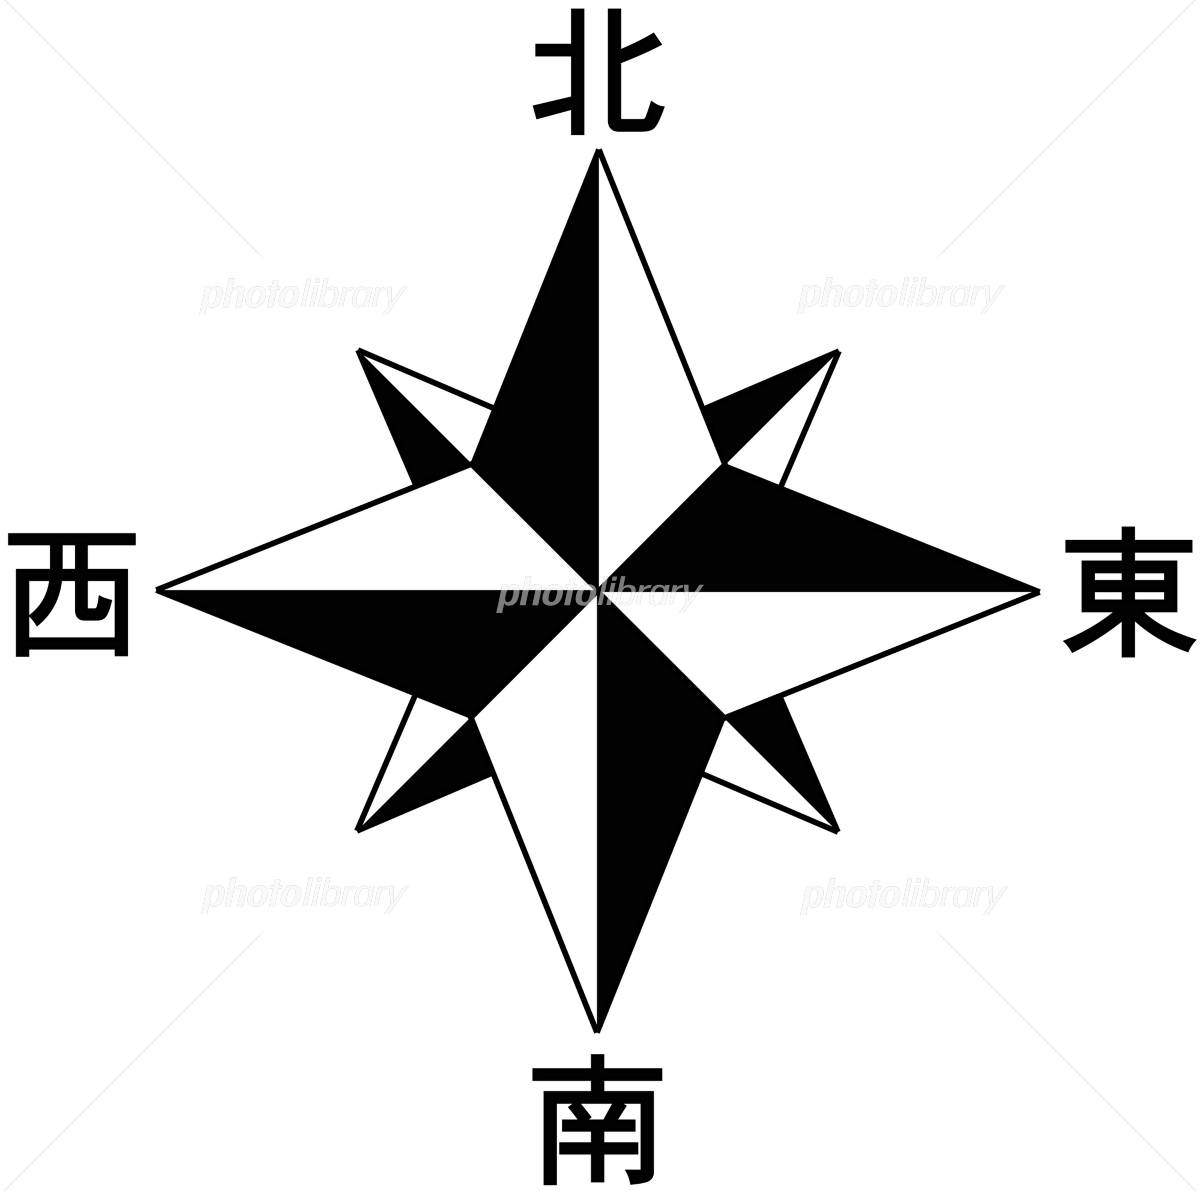 ��̥ޡ��� ����-stock photo